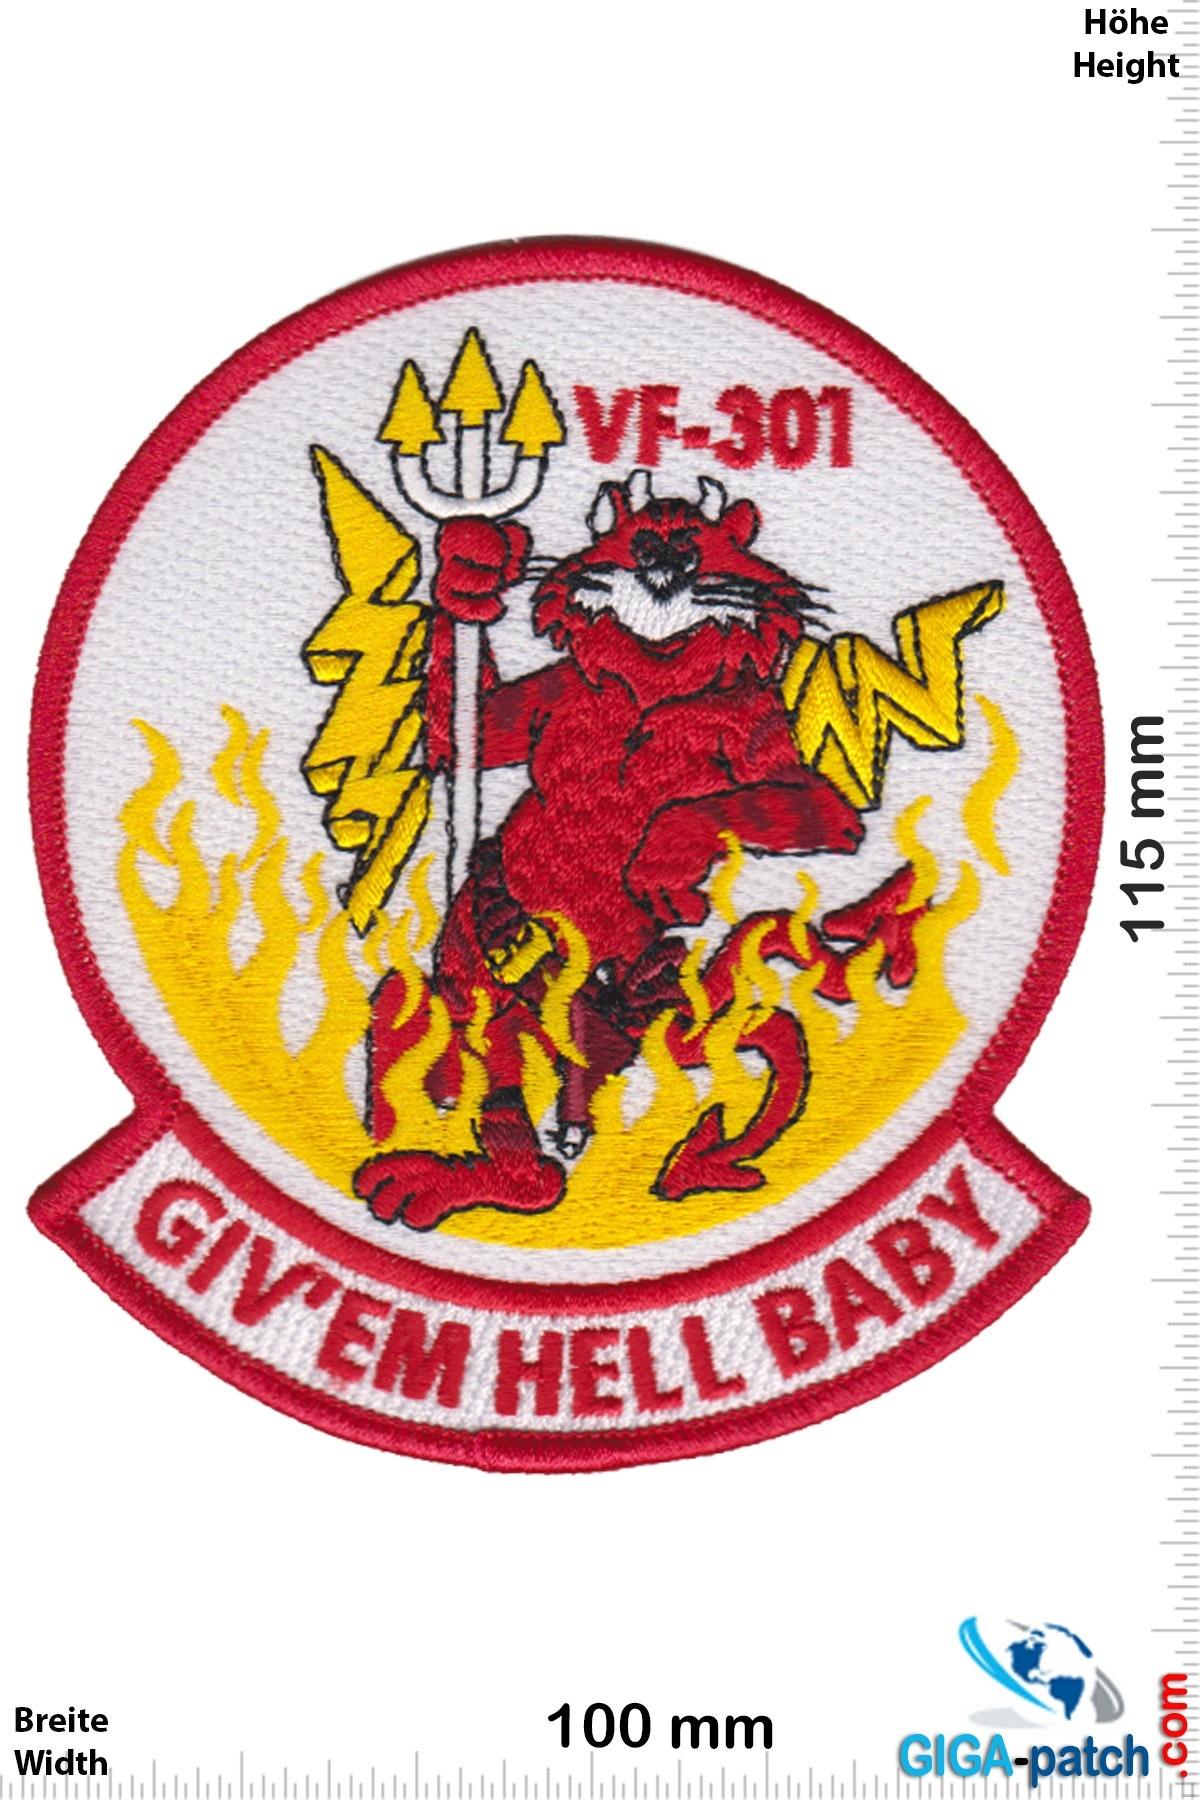 U.S. Navy US Navy VF-301 Fighter Squadron F-14 Tomcat - HQ